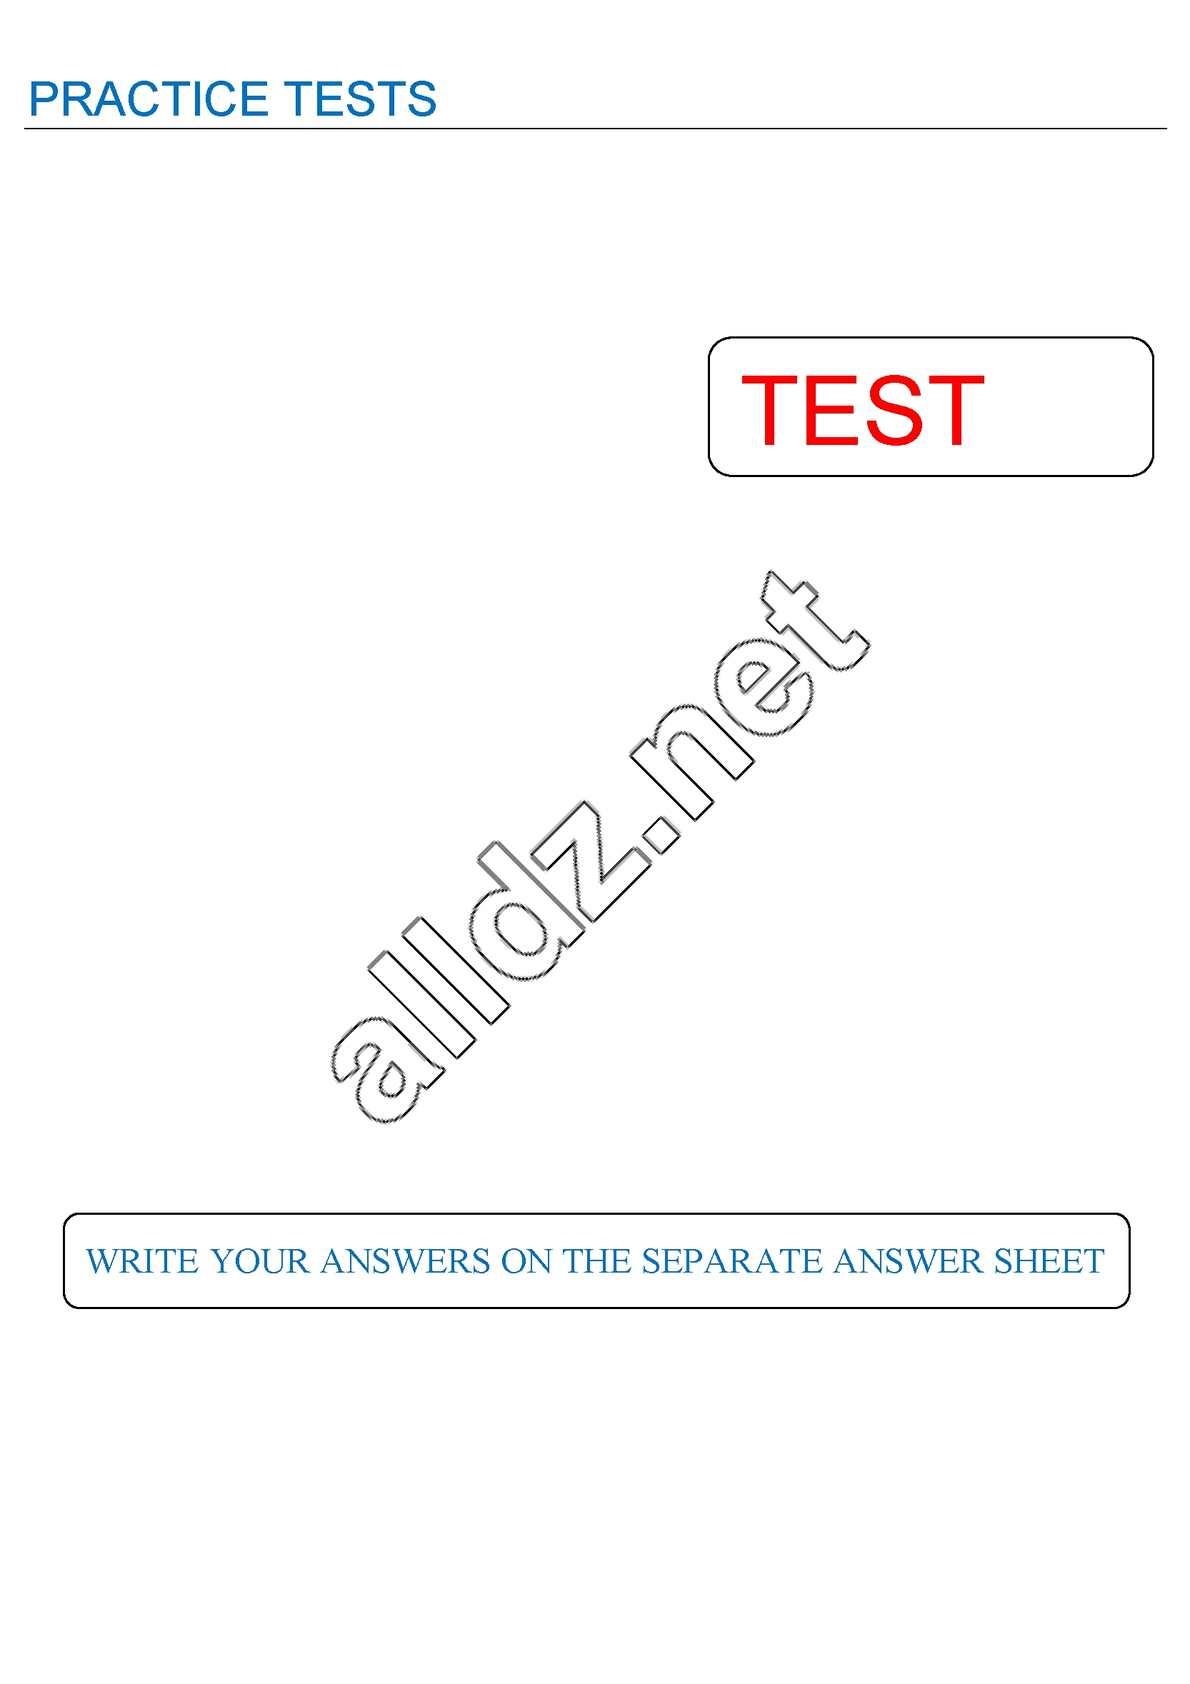 Calamo Zno Testi Angliyska 20 Testiv Science Generating Electricity By Joyfullamb Flashcards Easy